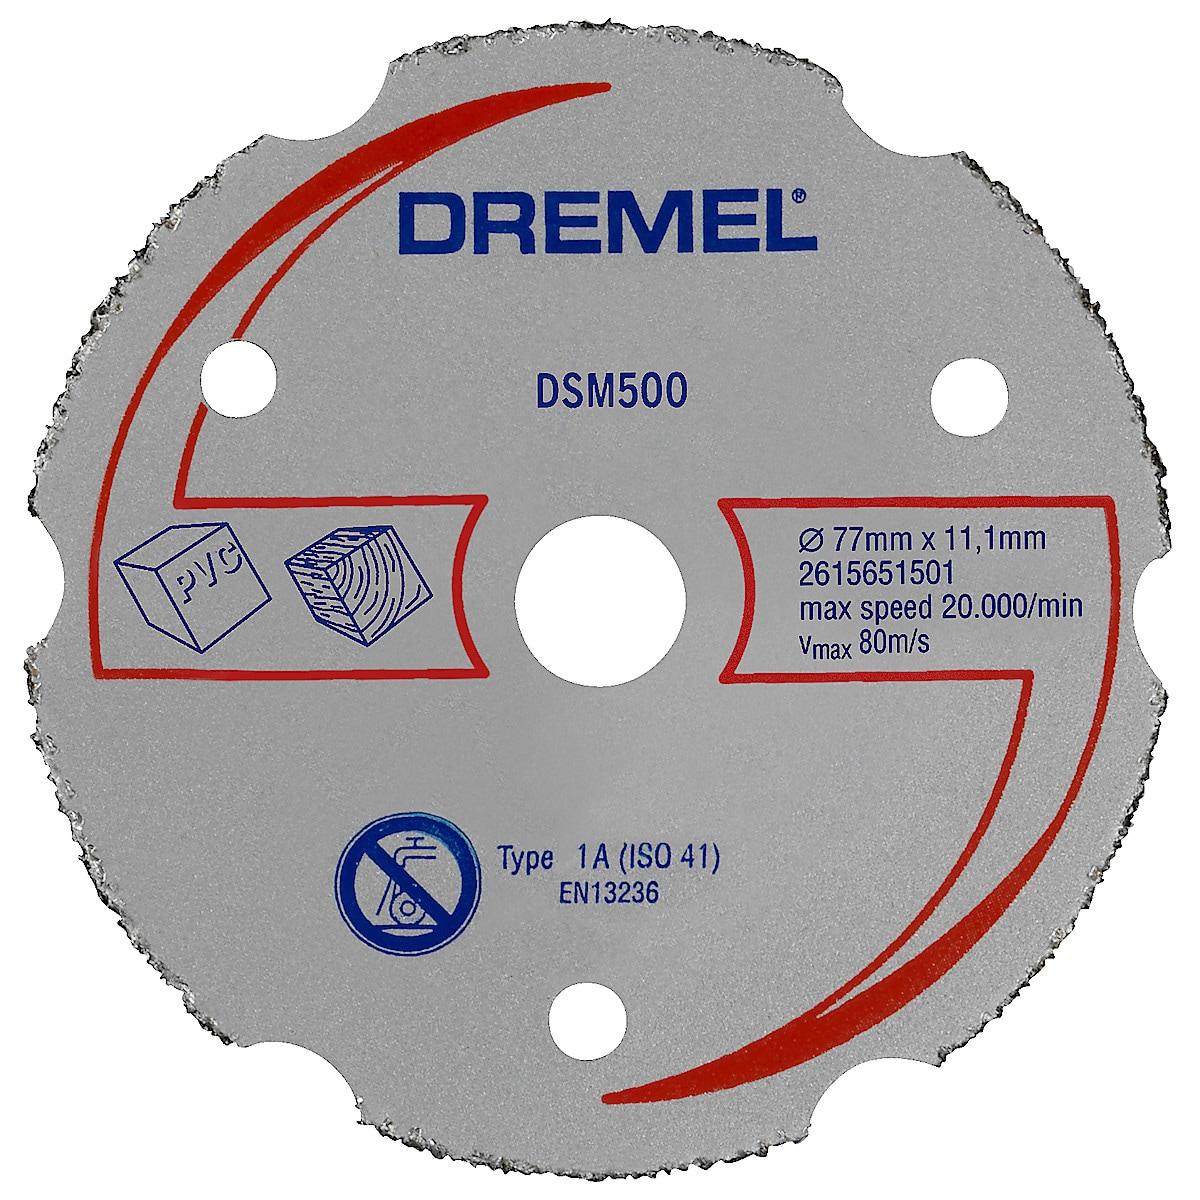 Kapskiva Dremel DSM500